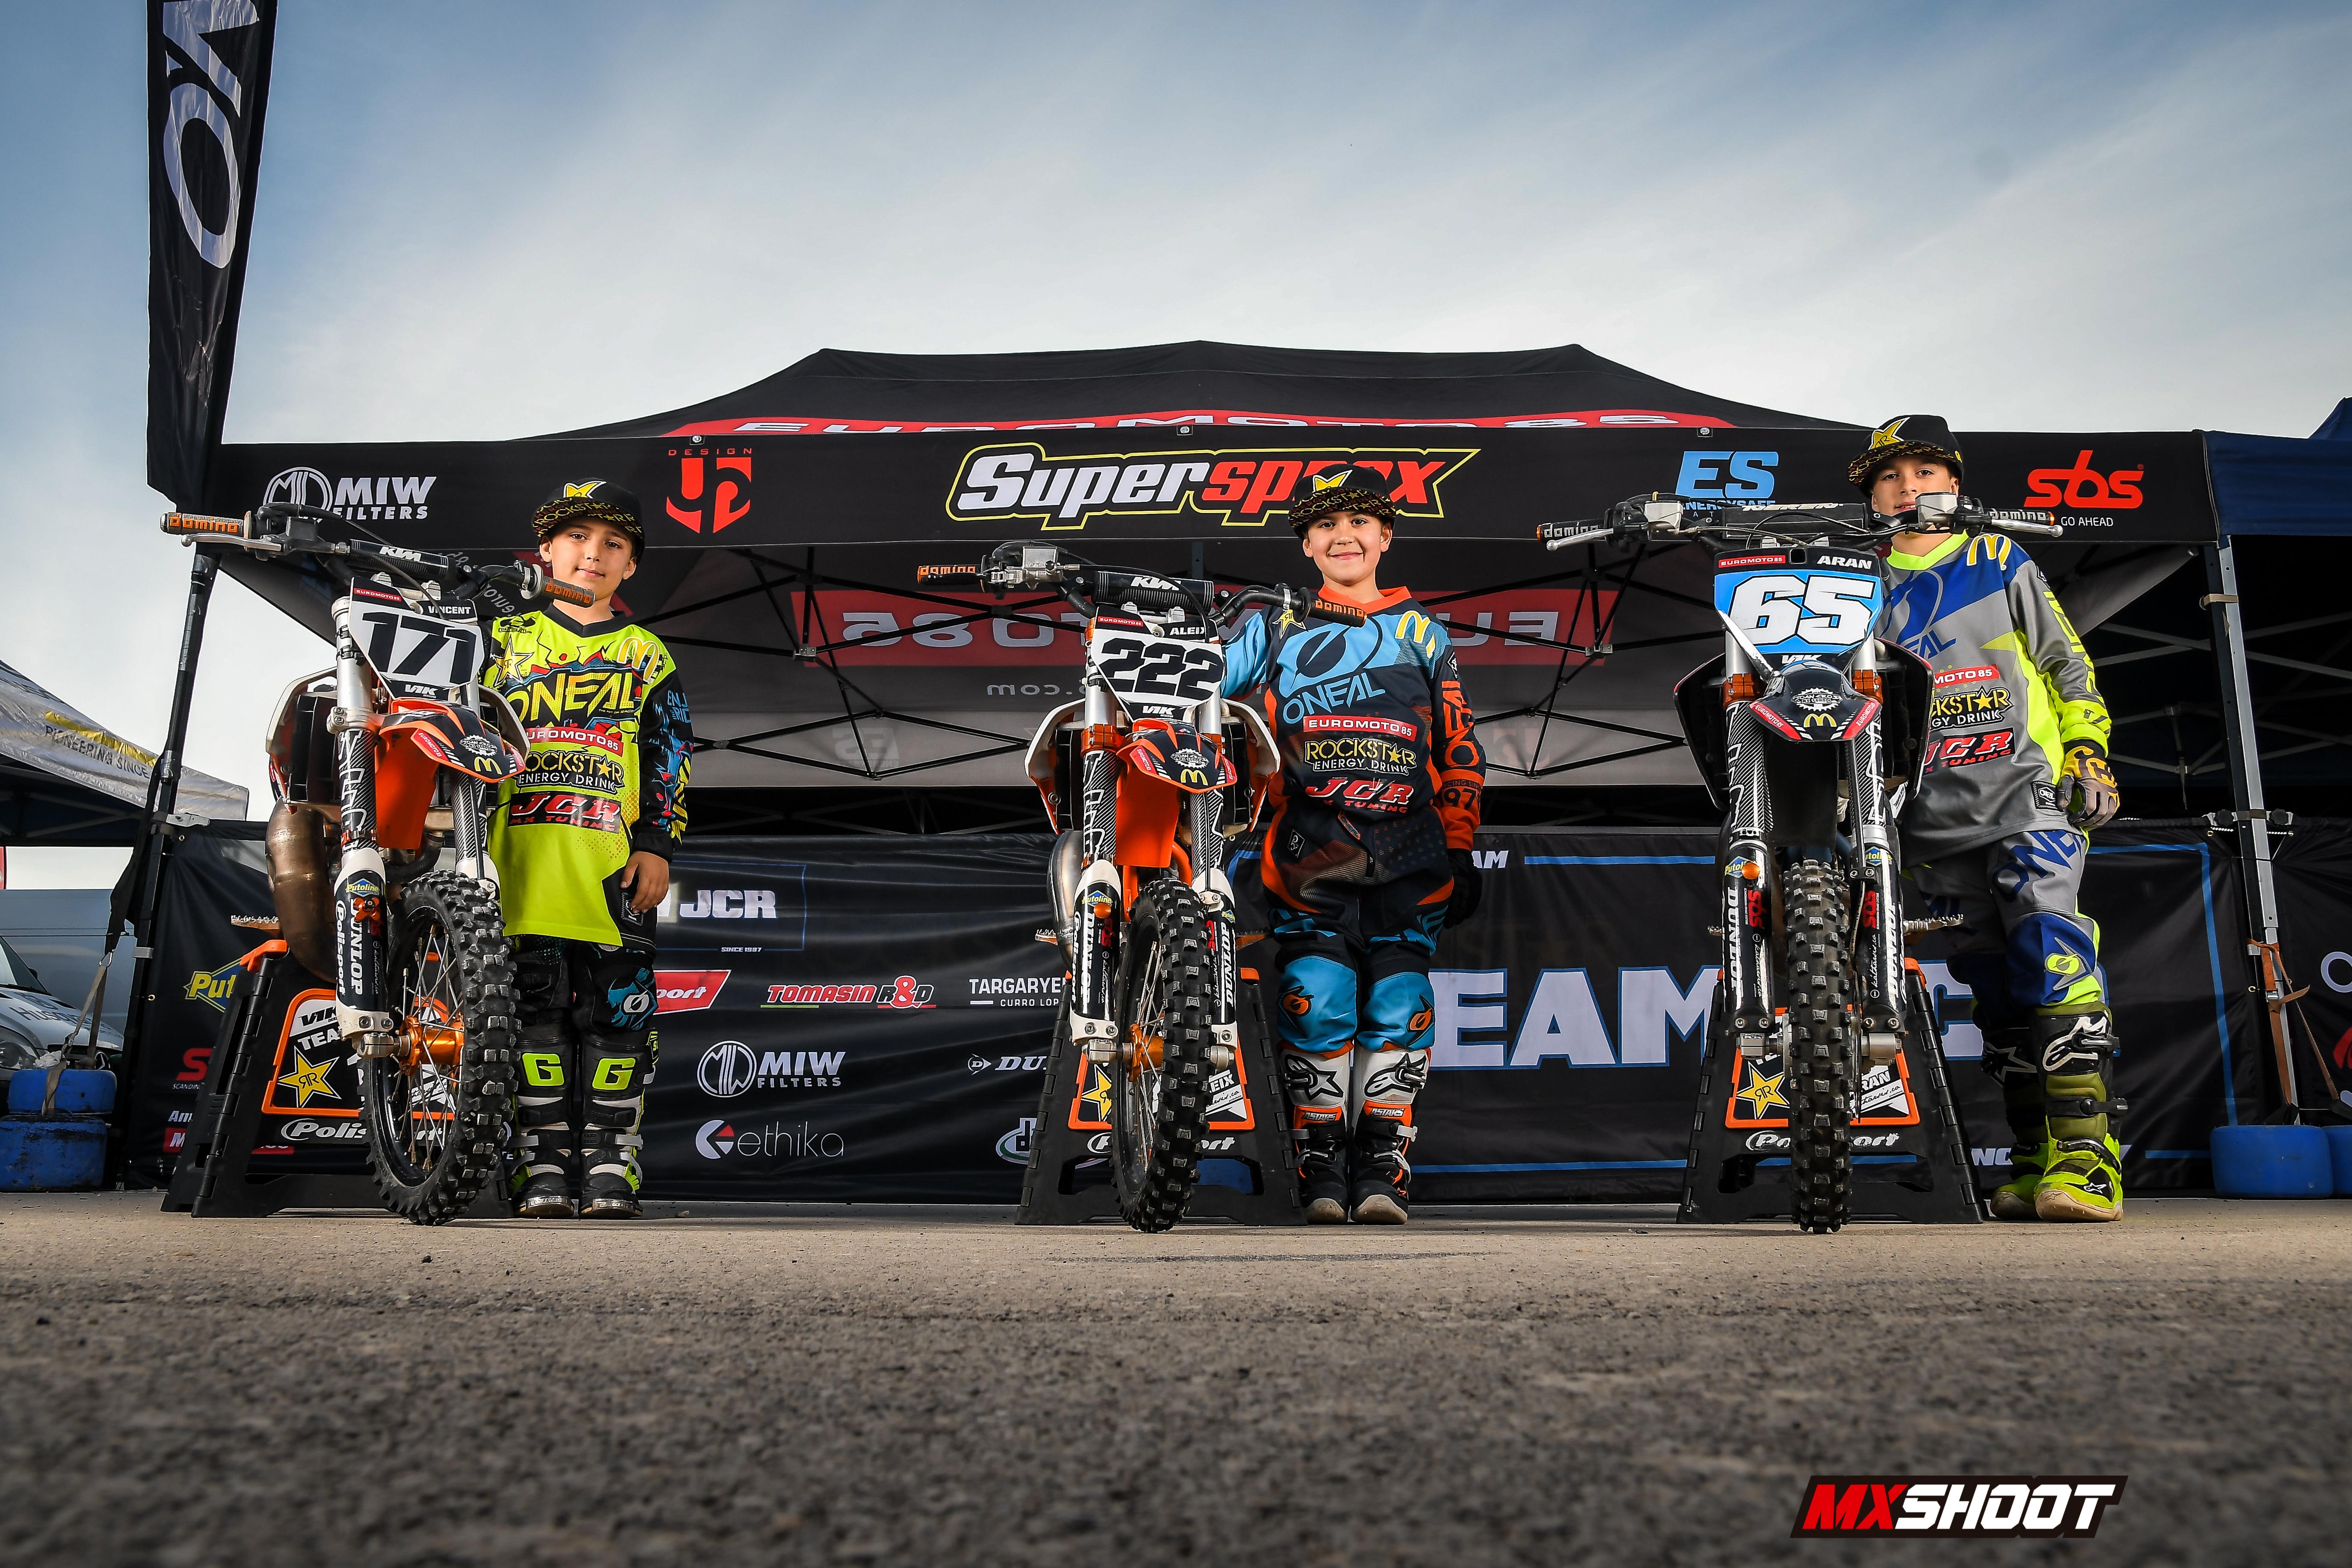 Pilotos Team JCR 2020 (KTM)